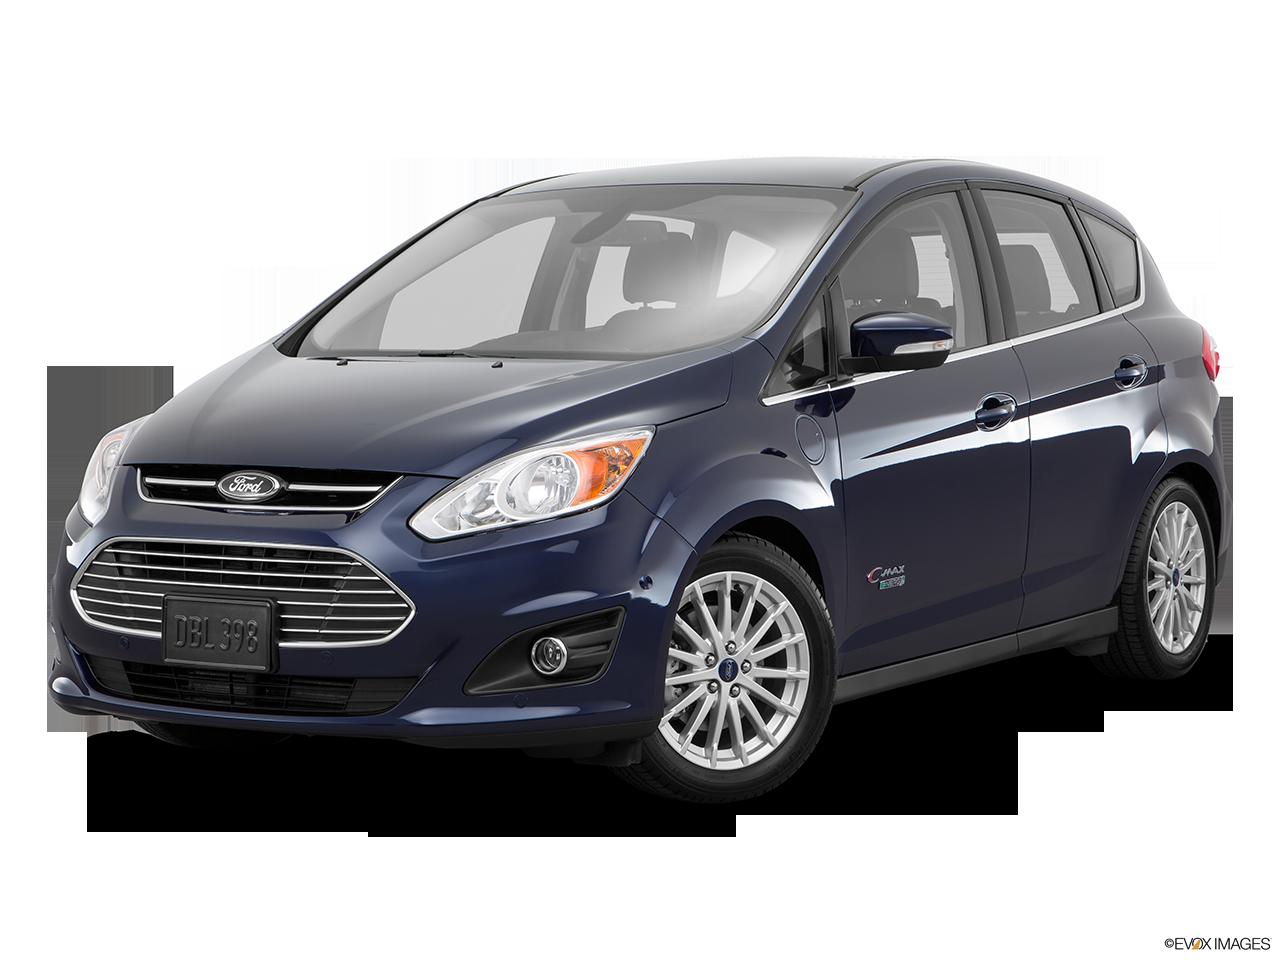 Ford C Max Review >> Ford Fusion Energi 0 60 | Upcomingcarshq.com